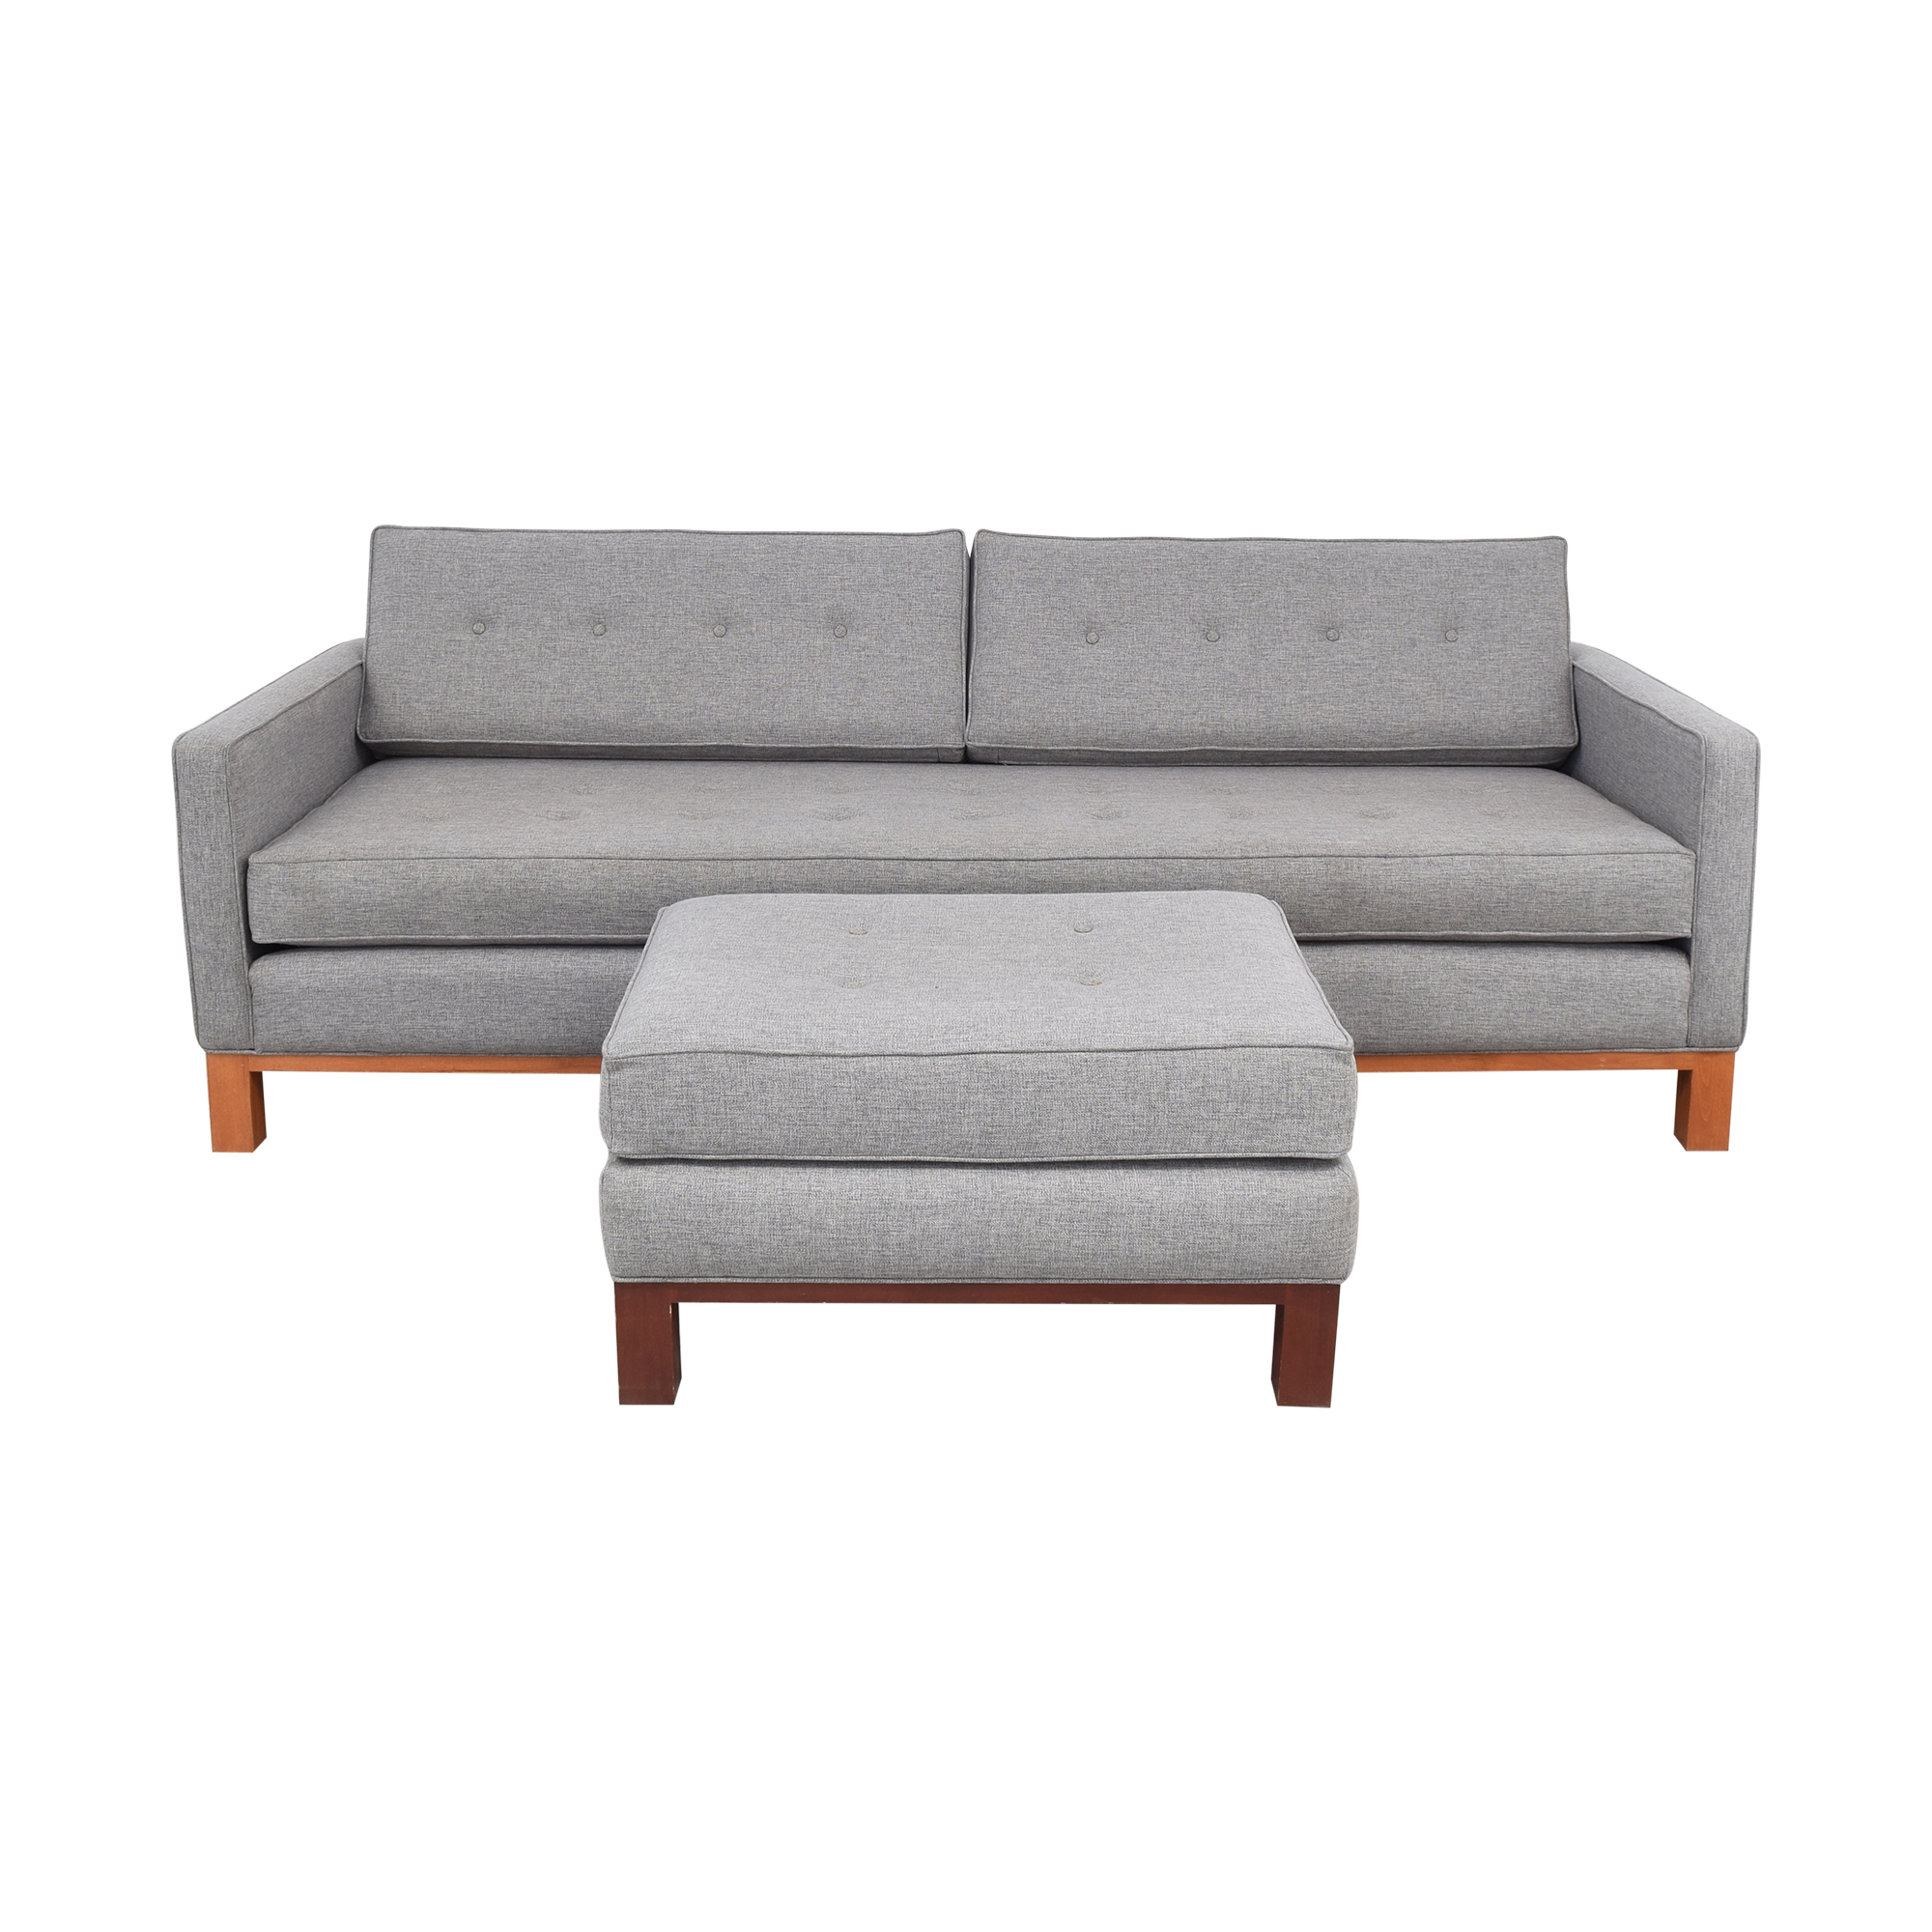 Joybird Joybird Raine Sofa & Ottoman ma